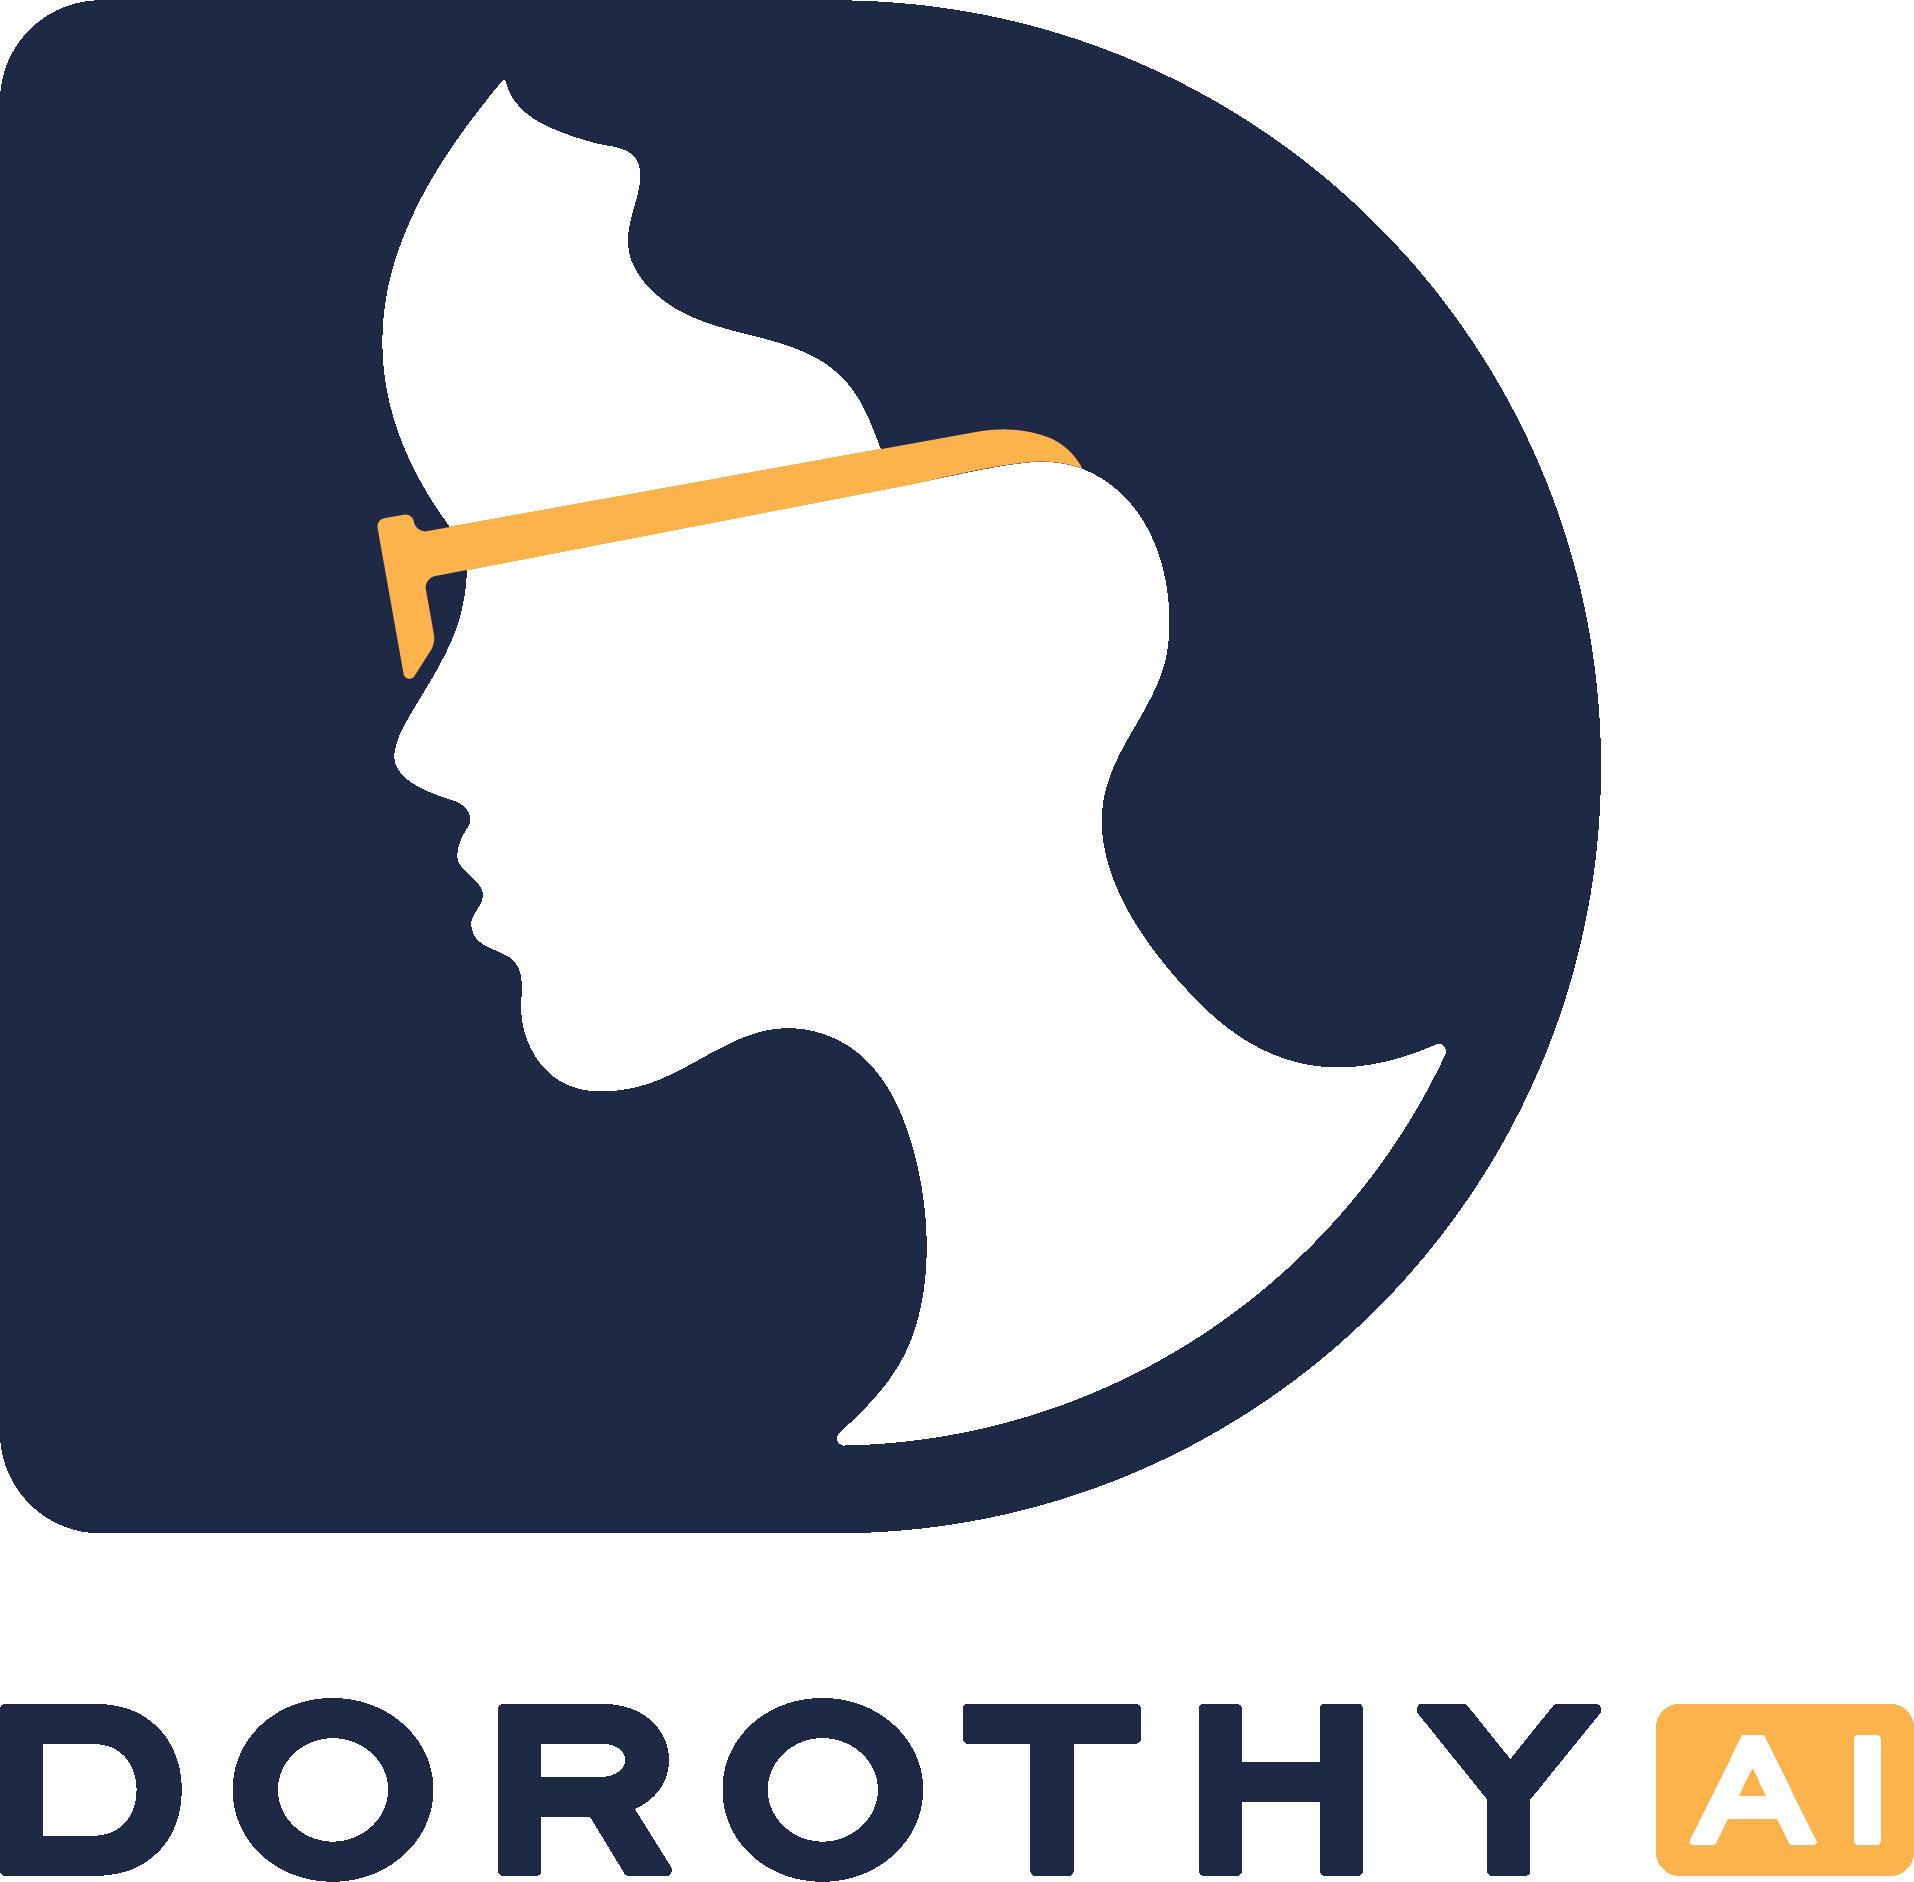 DorothyAI